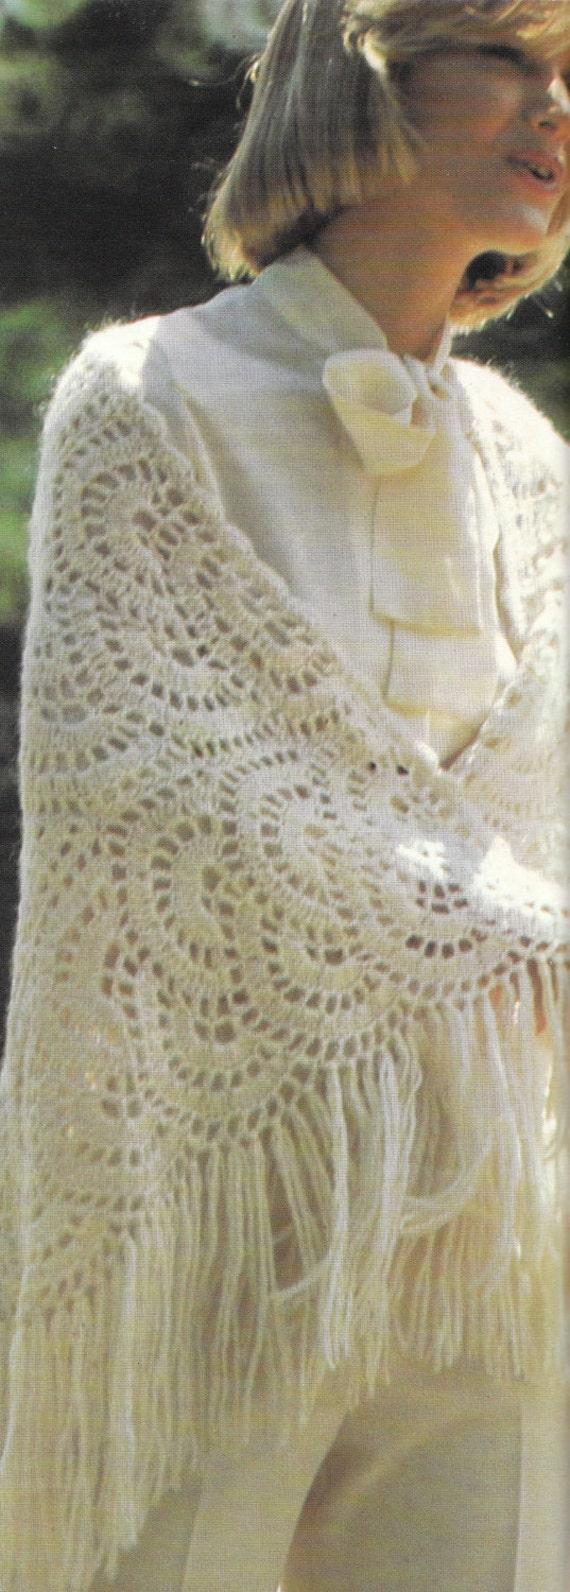 Crochet Patterns For Shawls Vintage : Crochet Semicircle Motif Shawl 1970s Vintage Crocheting